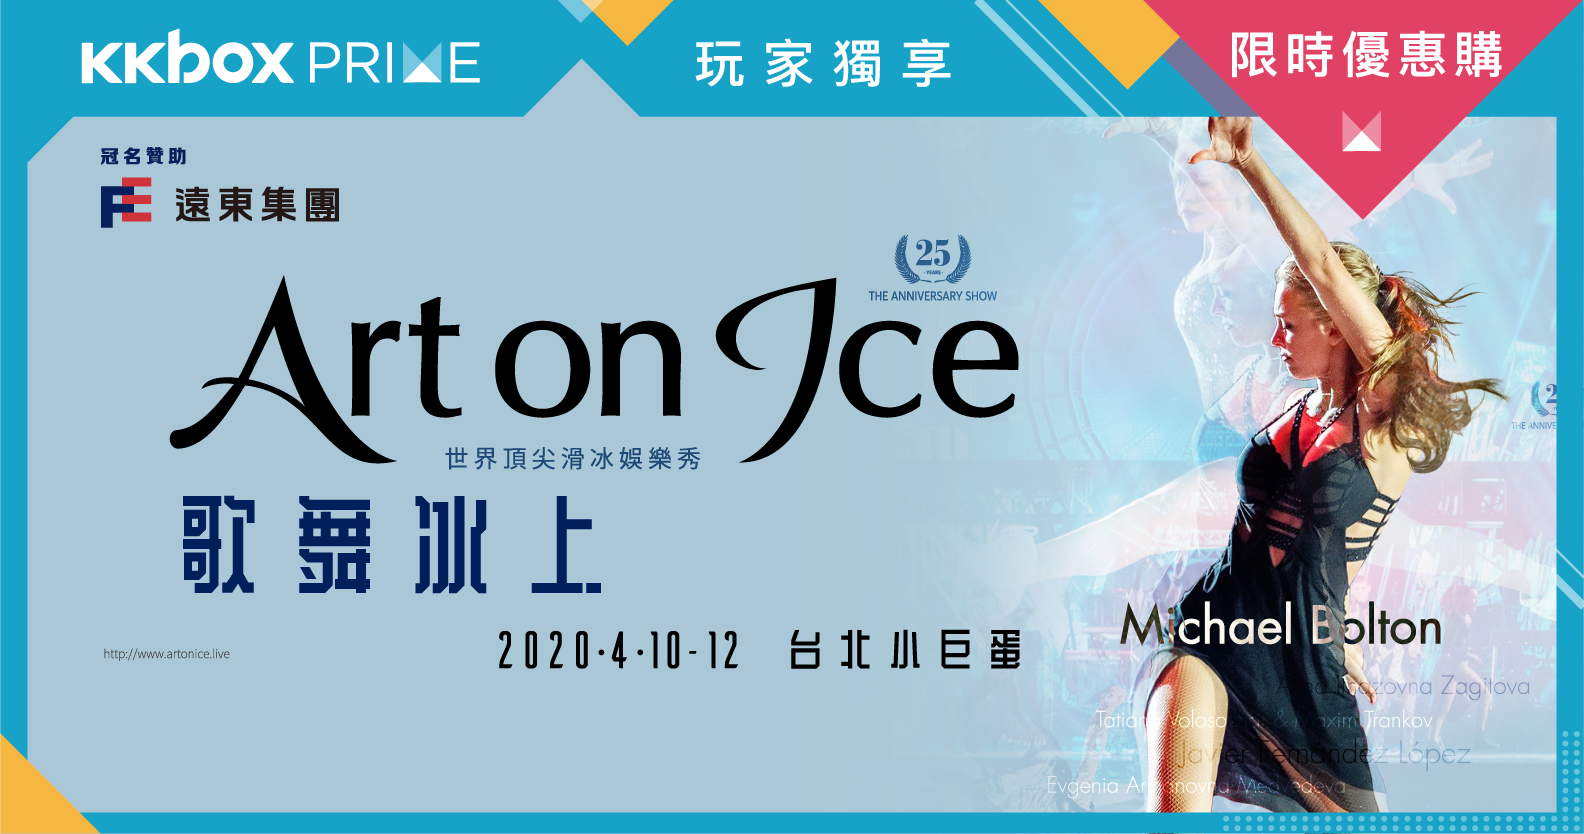 KKBOX Prime 會員獨享!限時領取世界頂尖冰上秀《Art on Ice歌舞冰上》購票折扣碼!